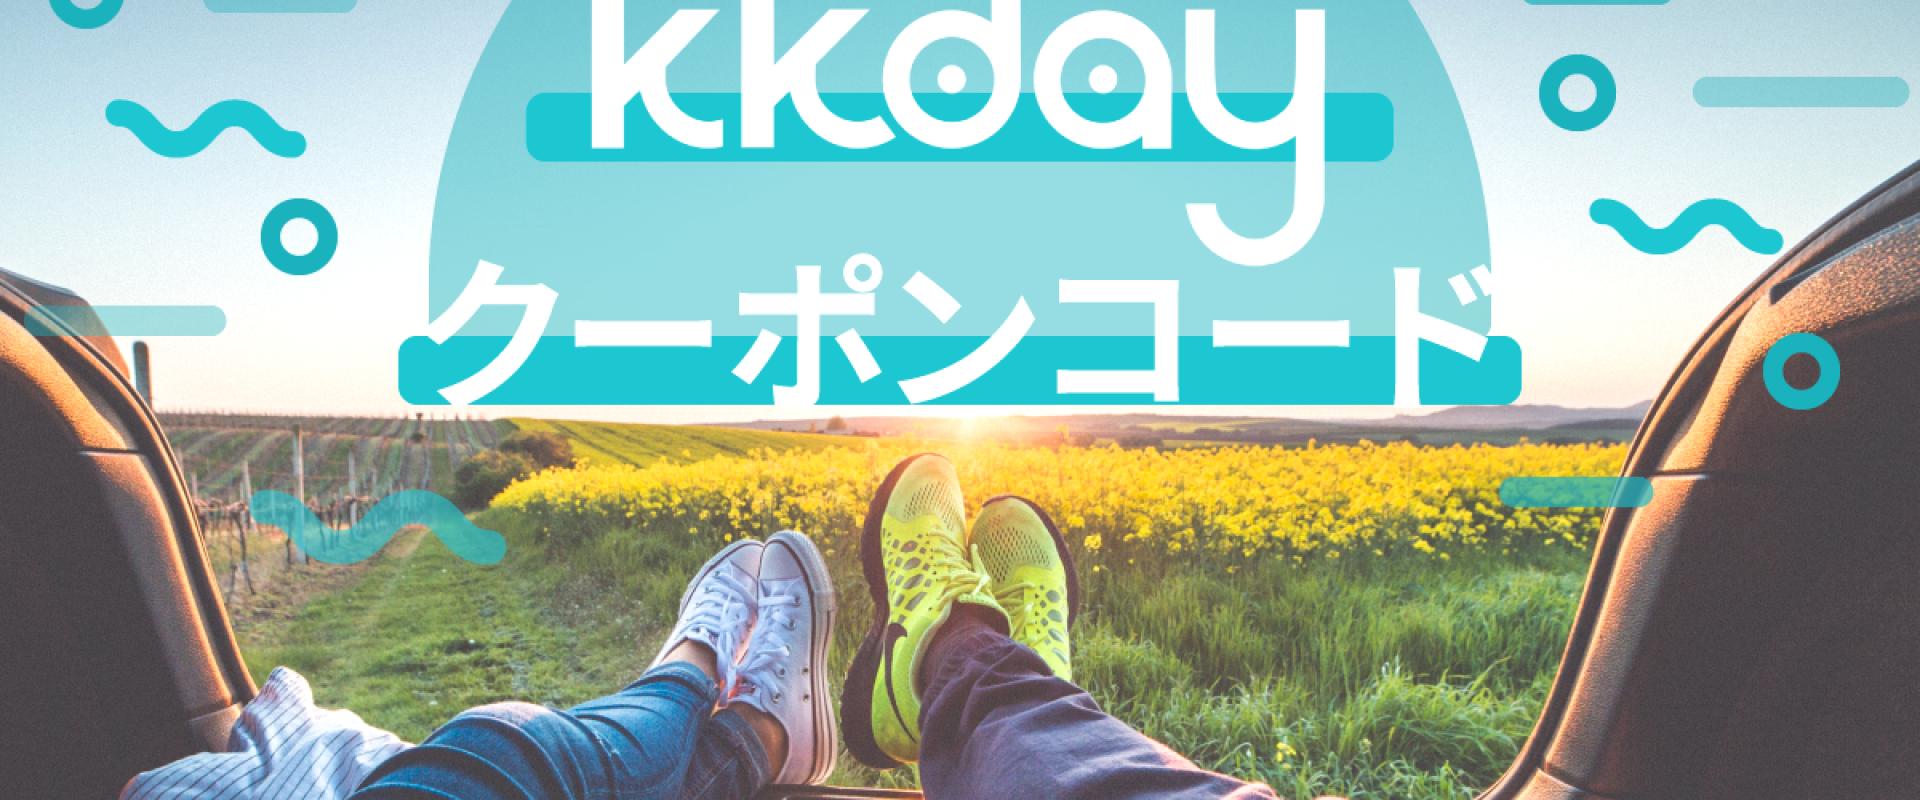 KKday-クーポンコード-01-1920x800.png